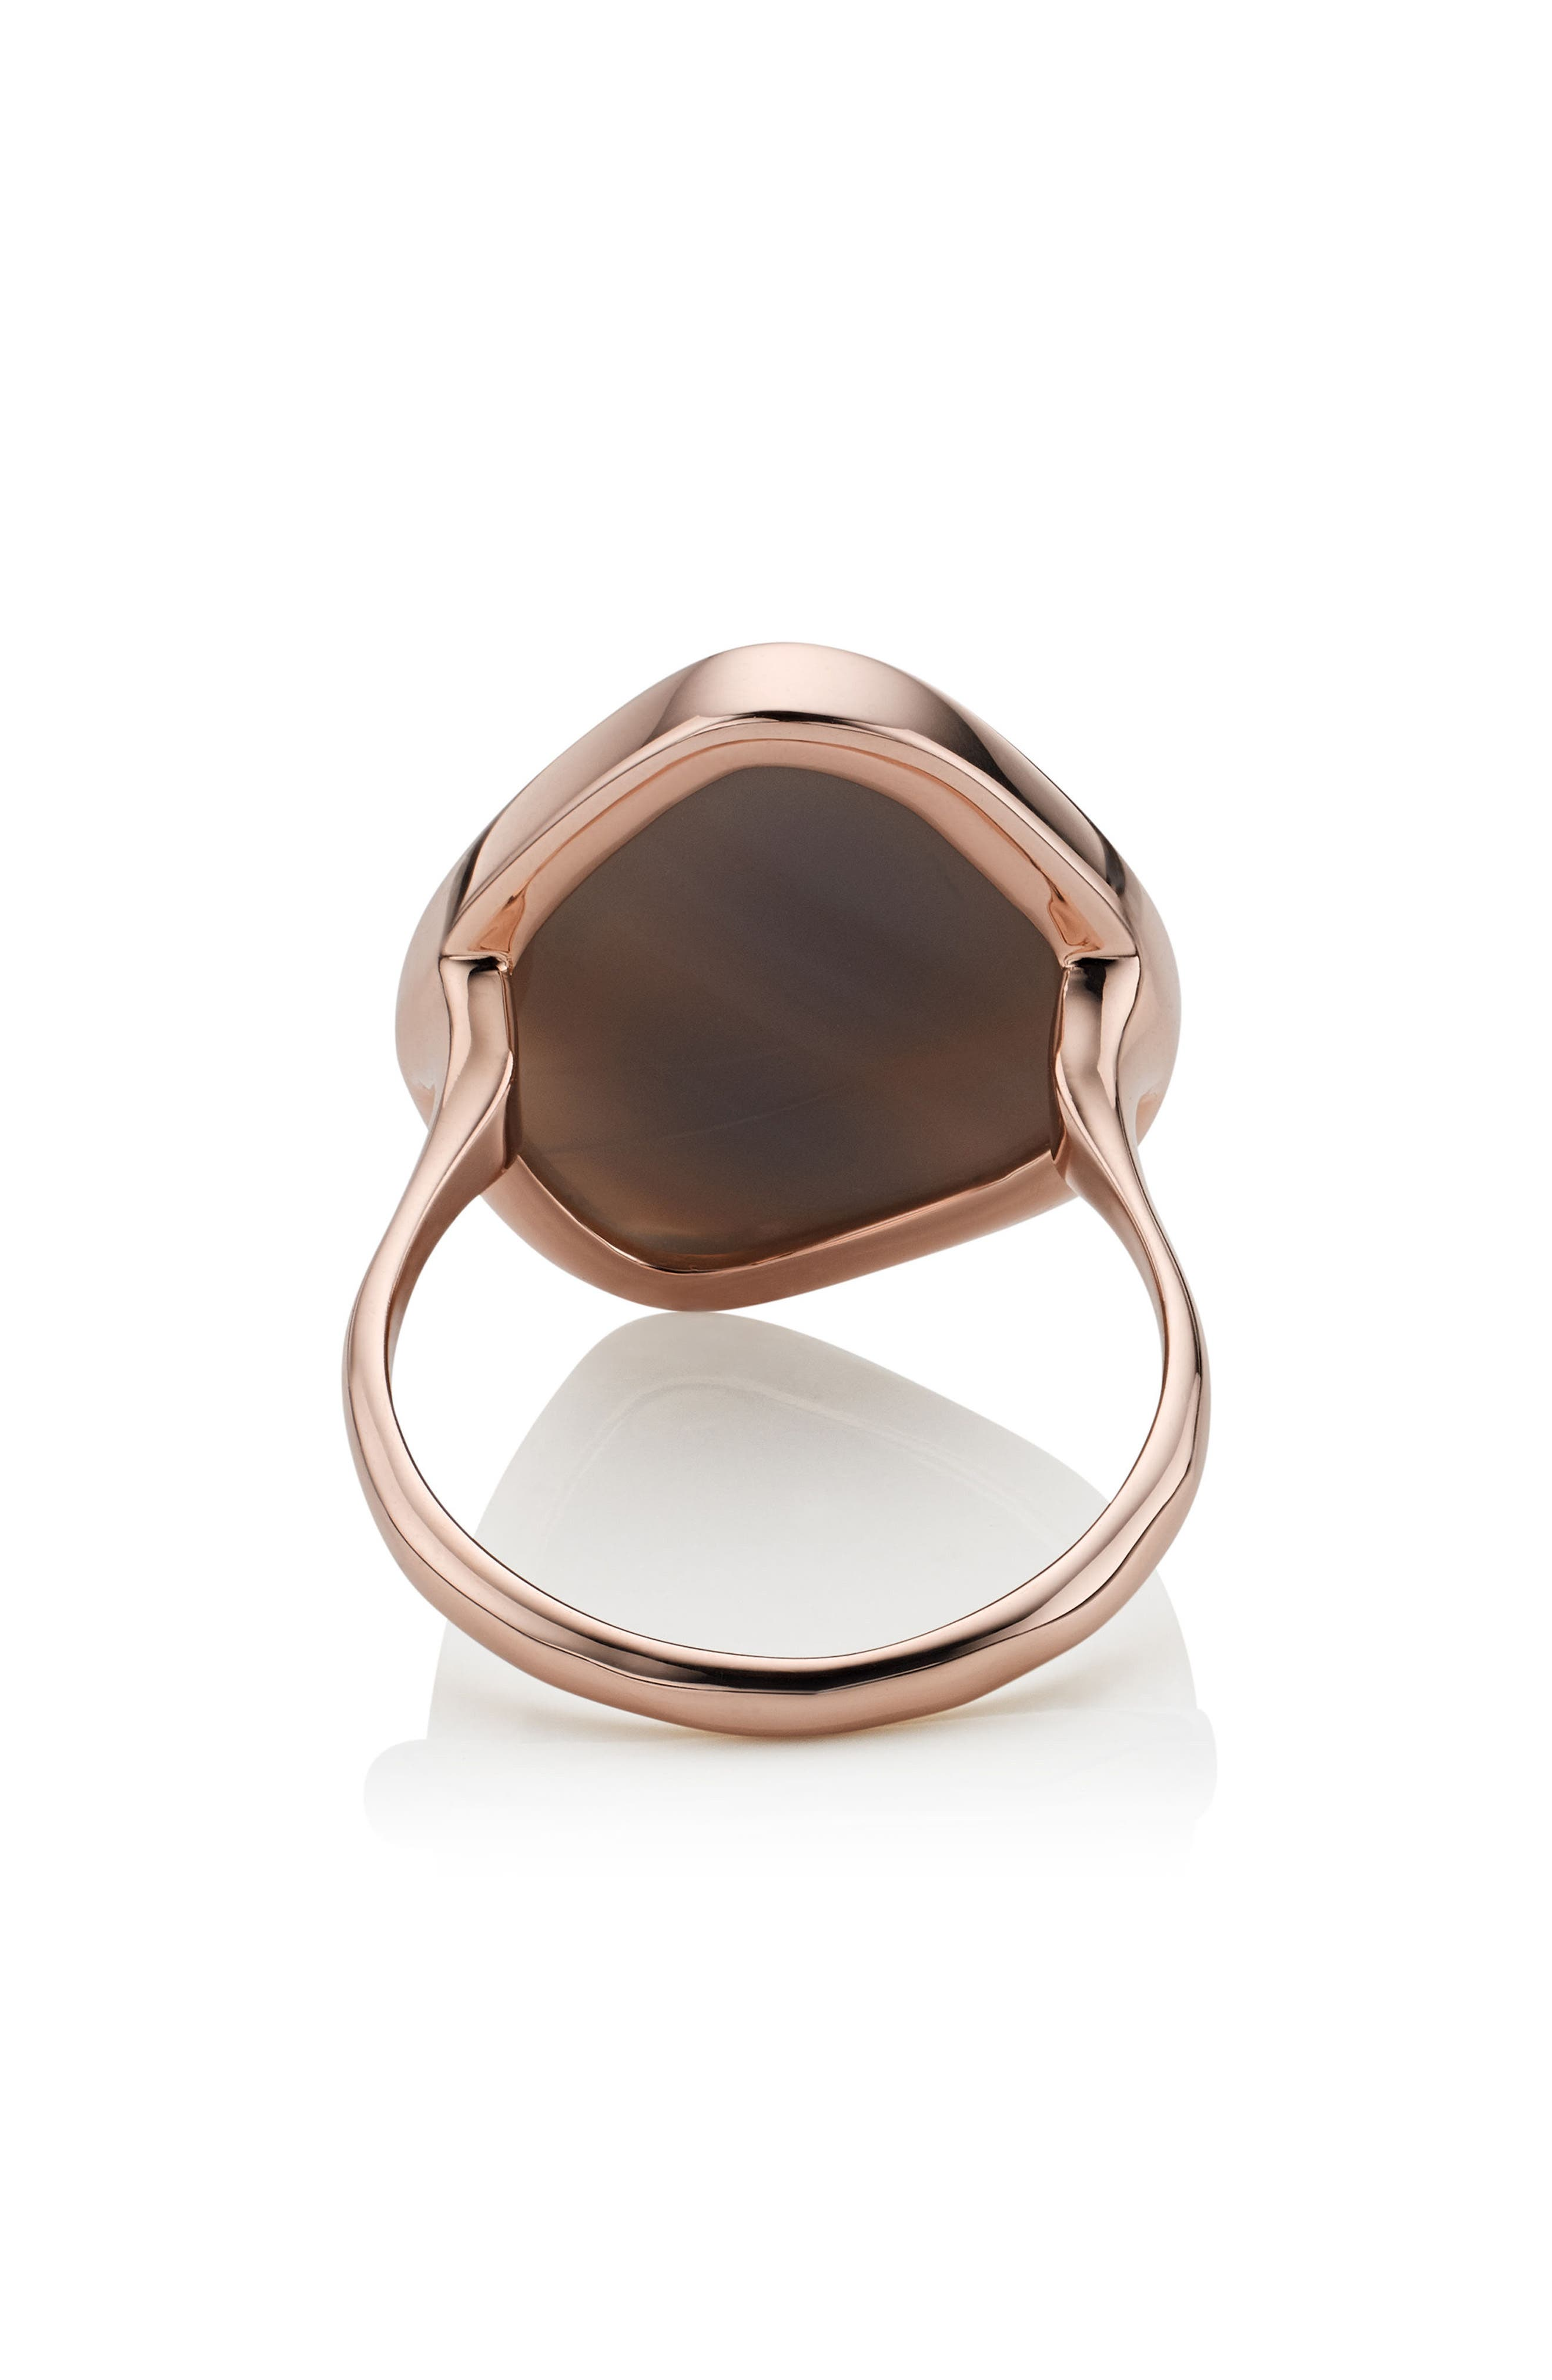 Siren Nugget Semiprecious Stone Ring,                             Alternate thumbnail 4, color,                             Grey Agate/ Rose Gold